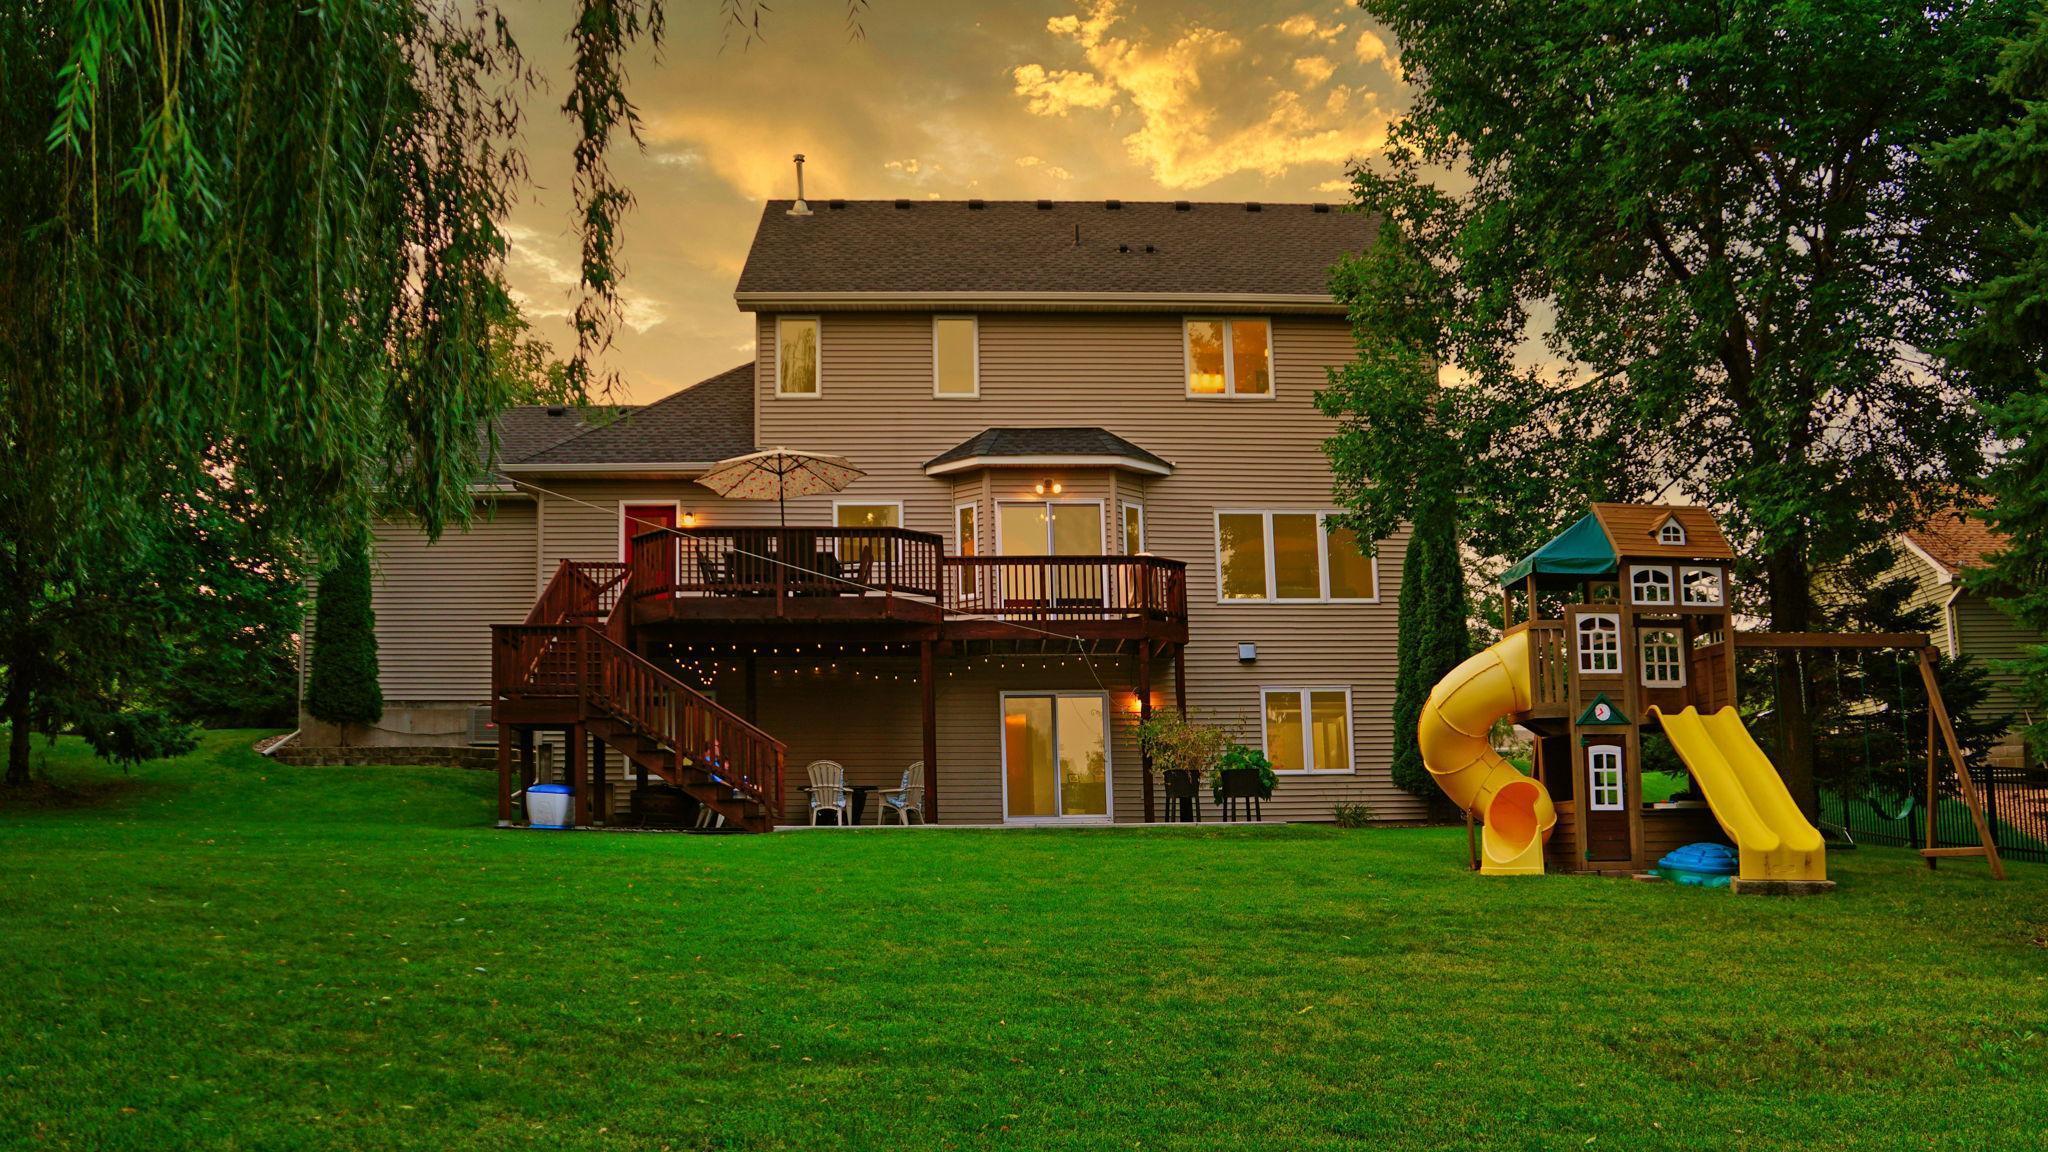 9256 Icosa Street, Lakeville MN 55044 - Photo 2